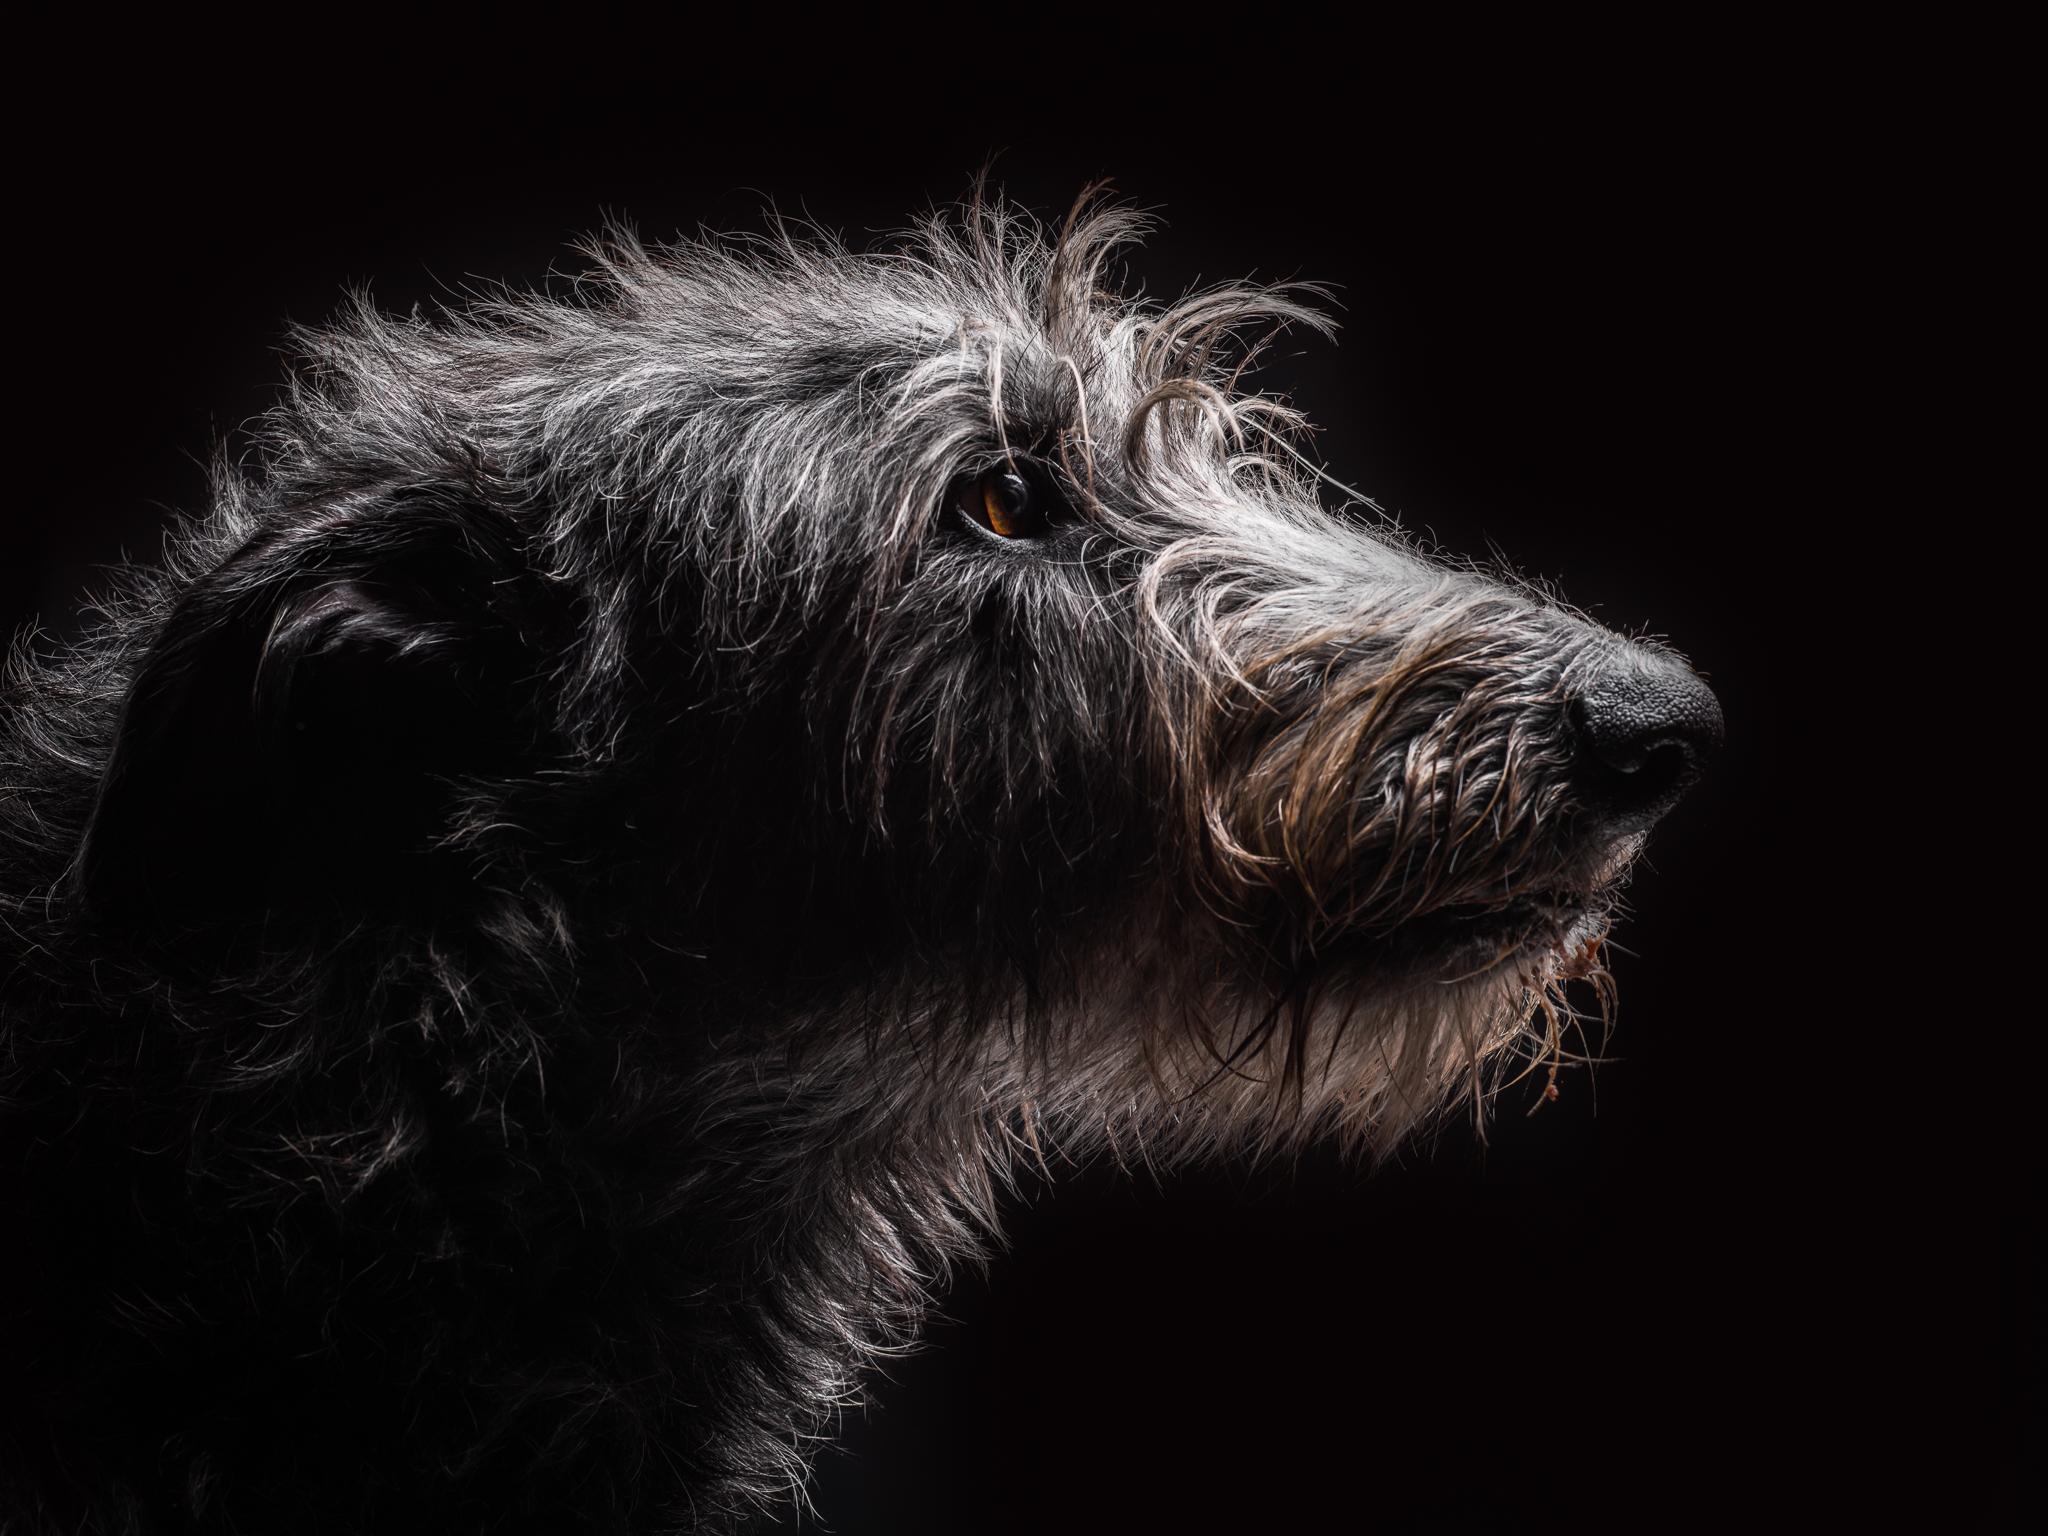 klaus-dyba-dog-photography-irish-wolfhound